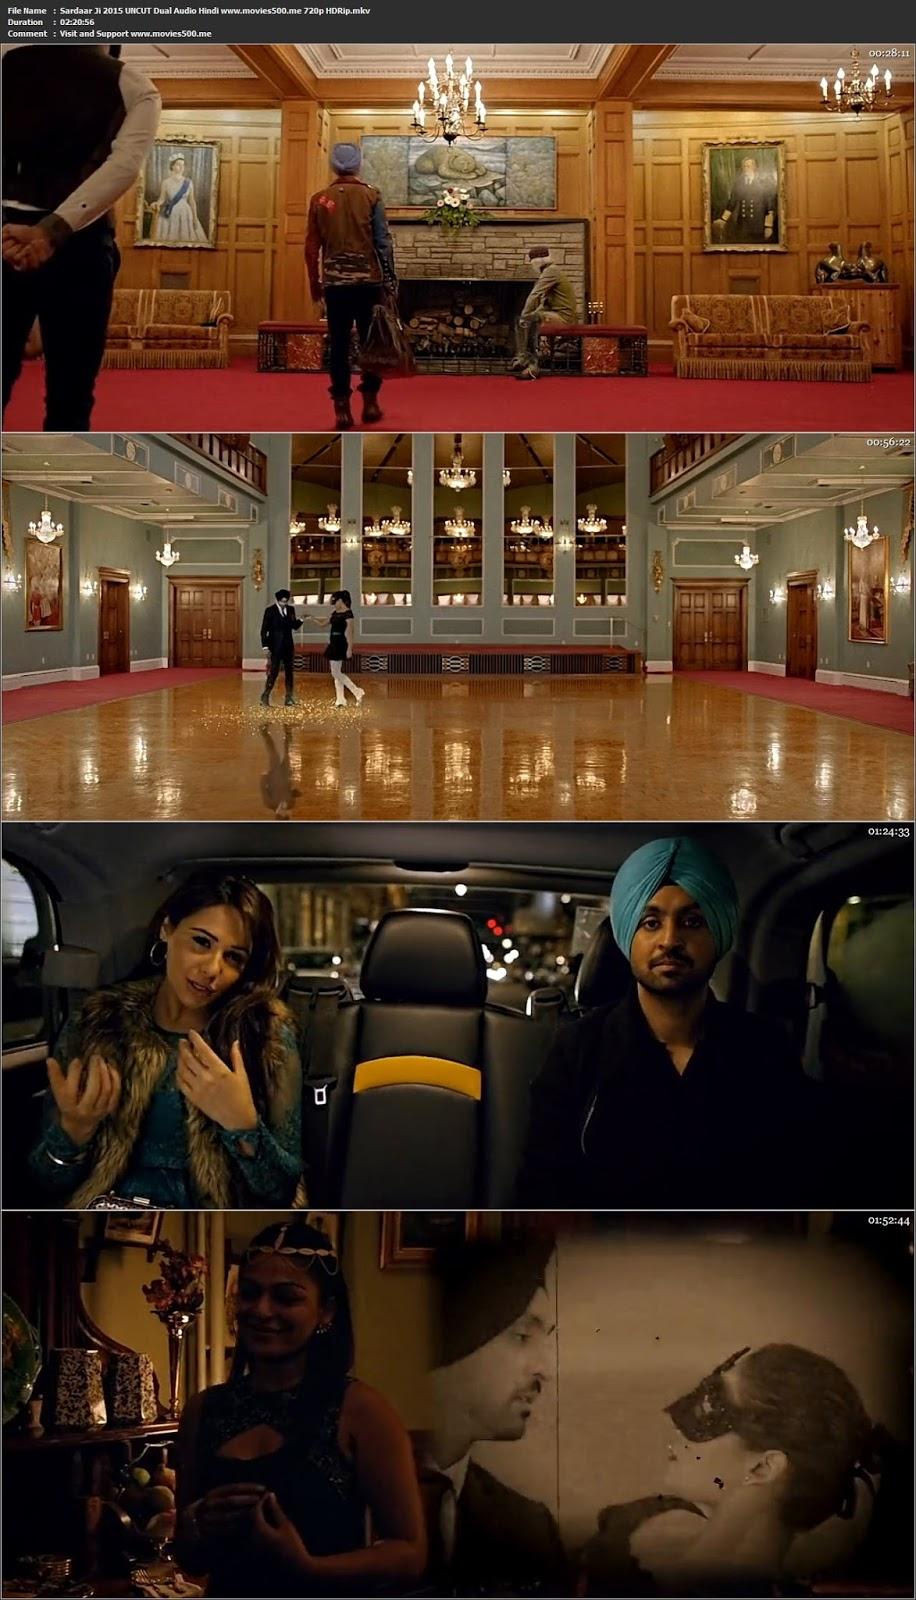 Sardaar Ji 2015 UNCUT Punjabi Movie HDRip 720p 1.4GB at lucysdoggrooming.com